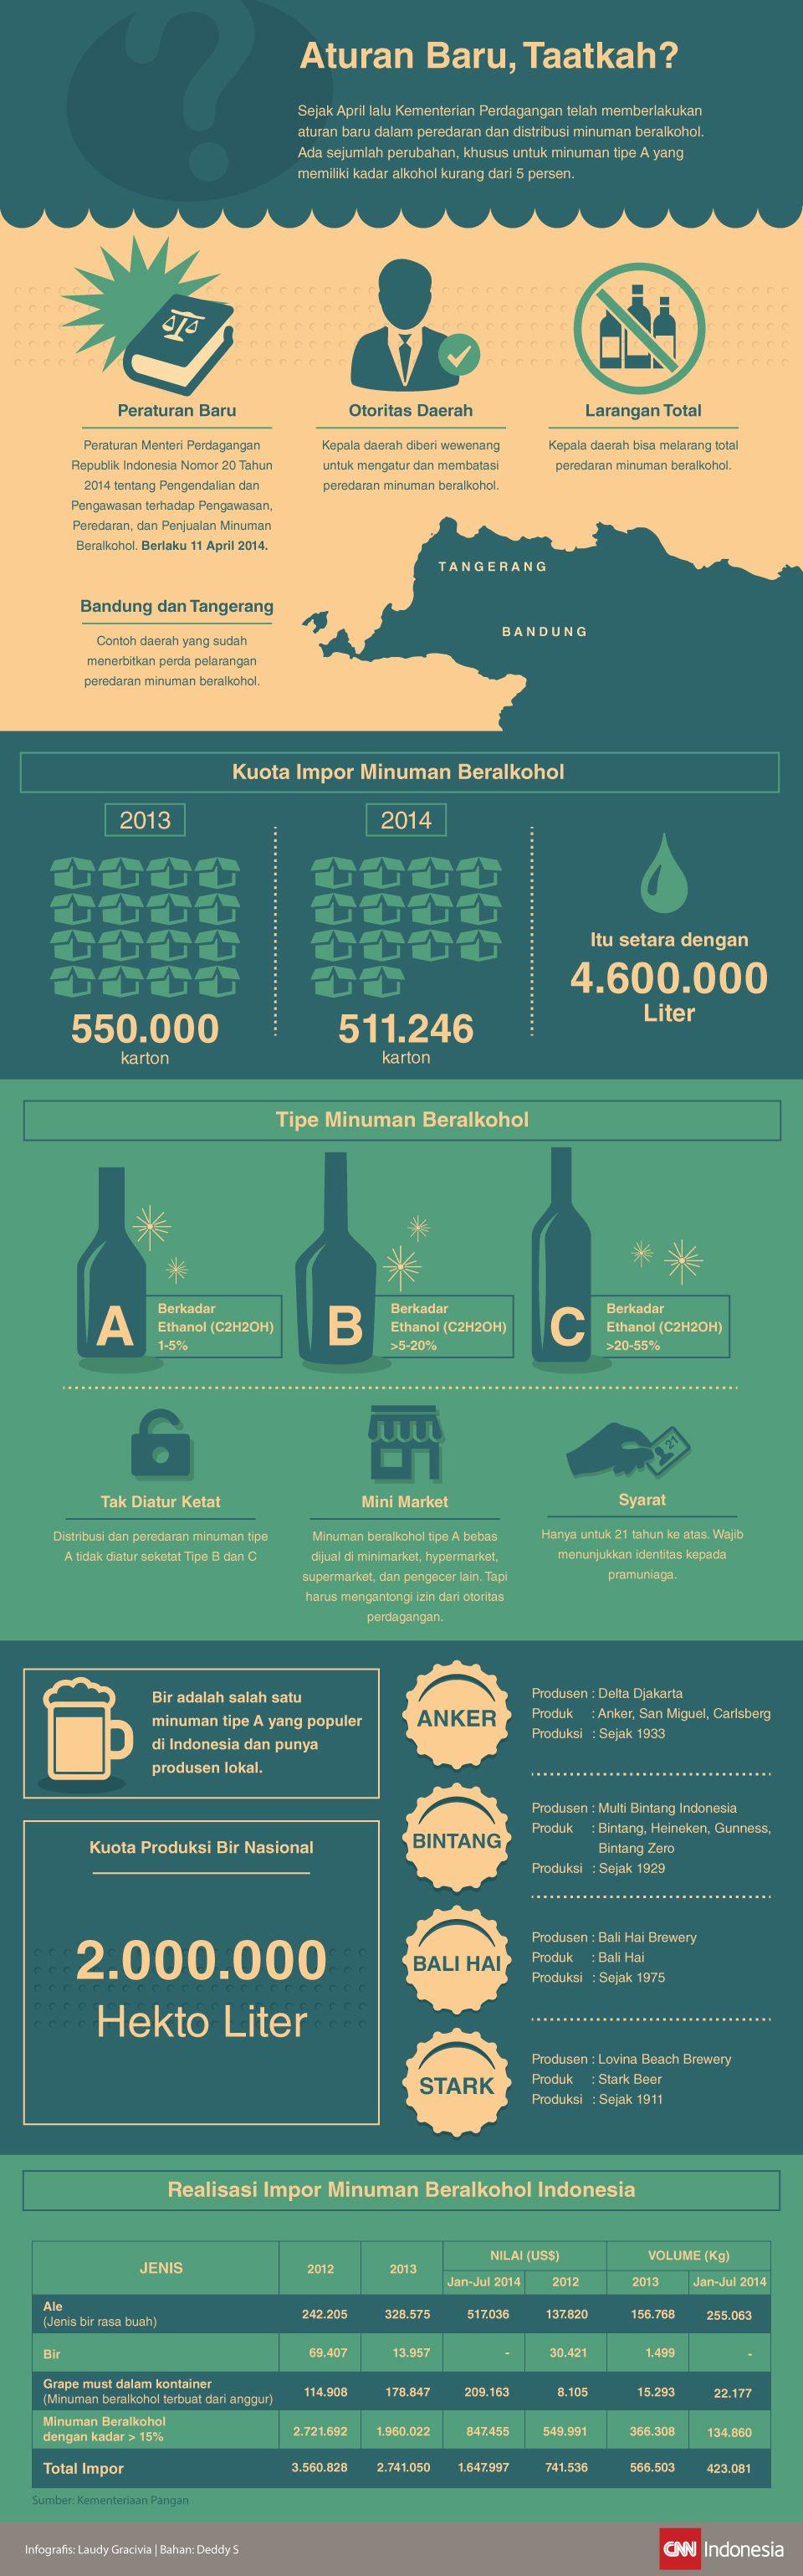 Infografis mengenai aturan baru mengenai minuman beralkohol